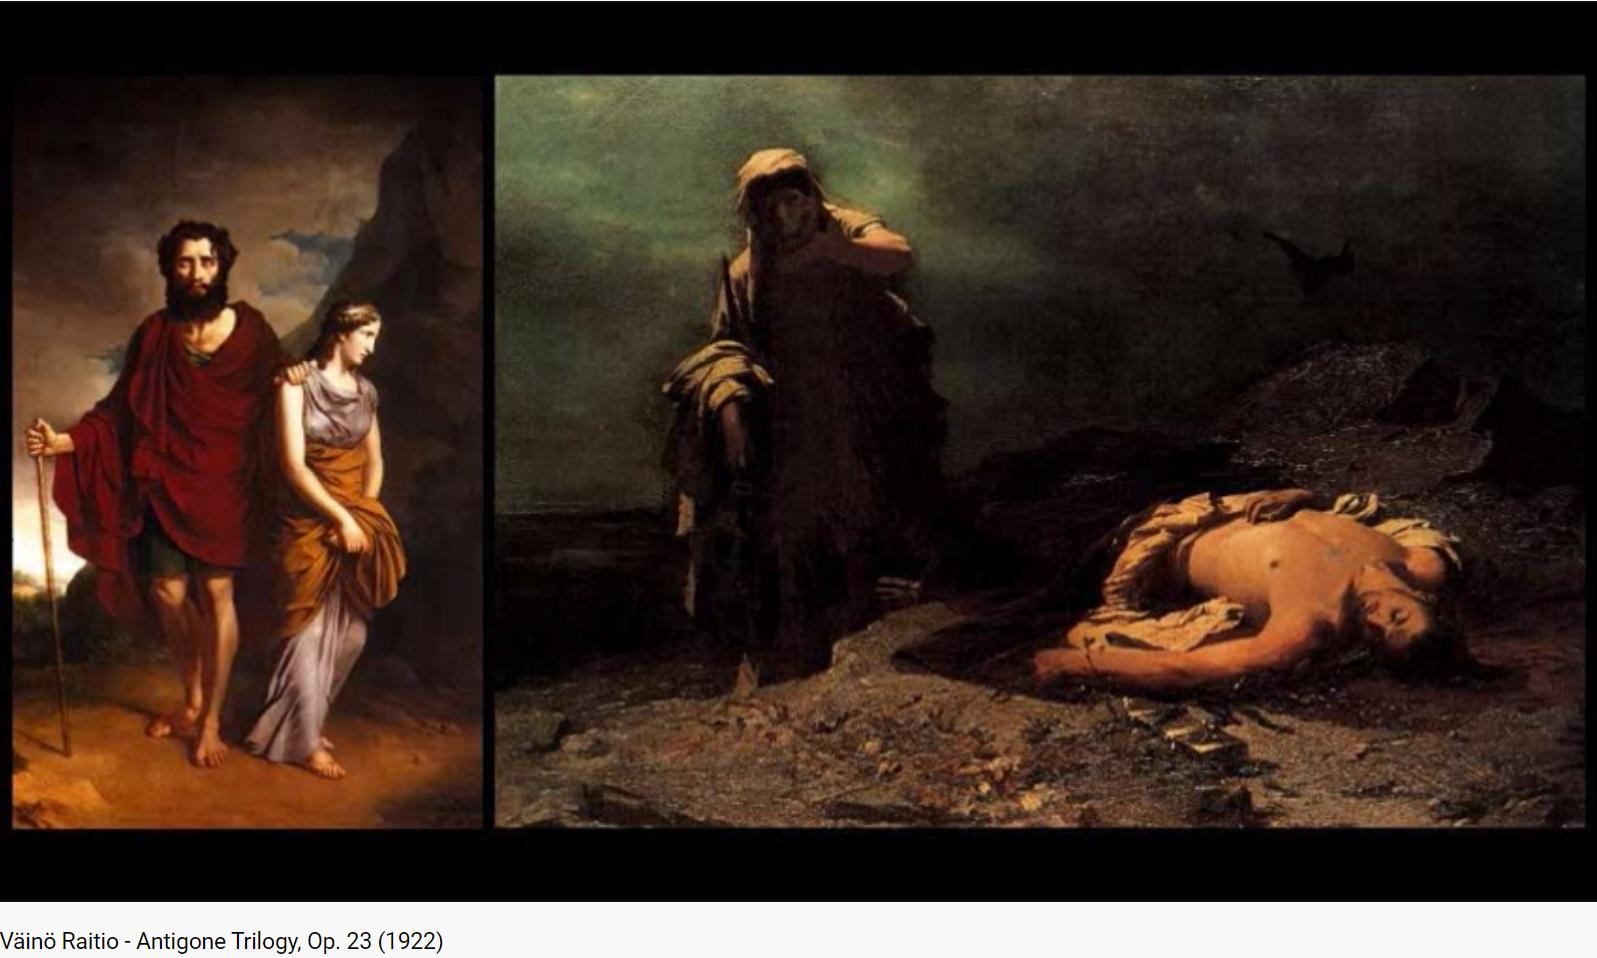 Raitio Antigone Trilogy